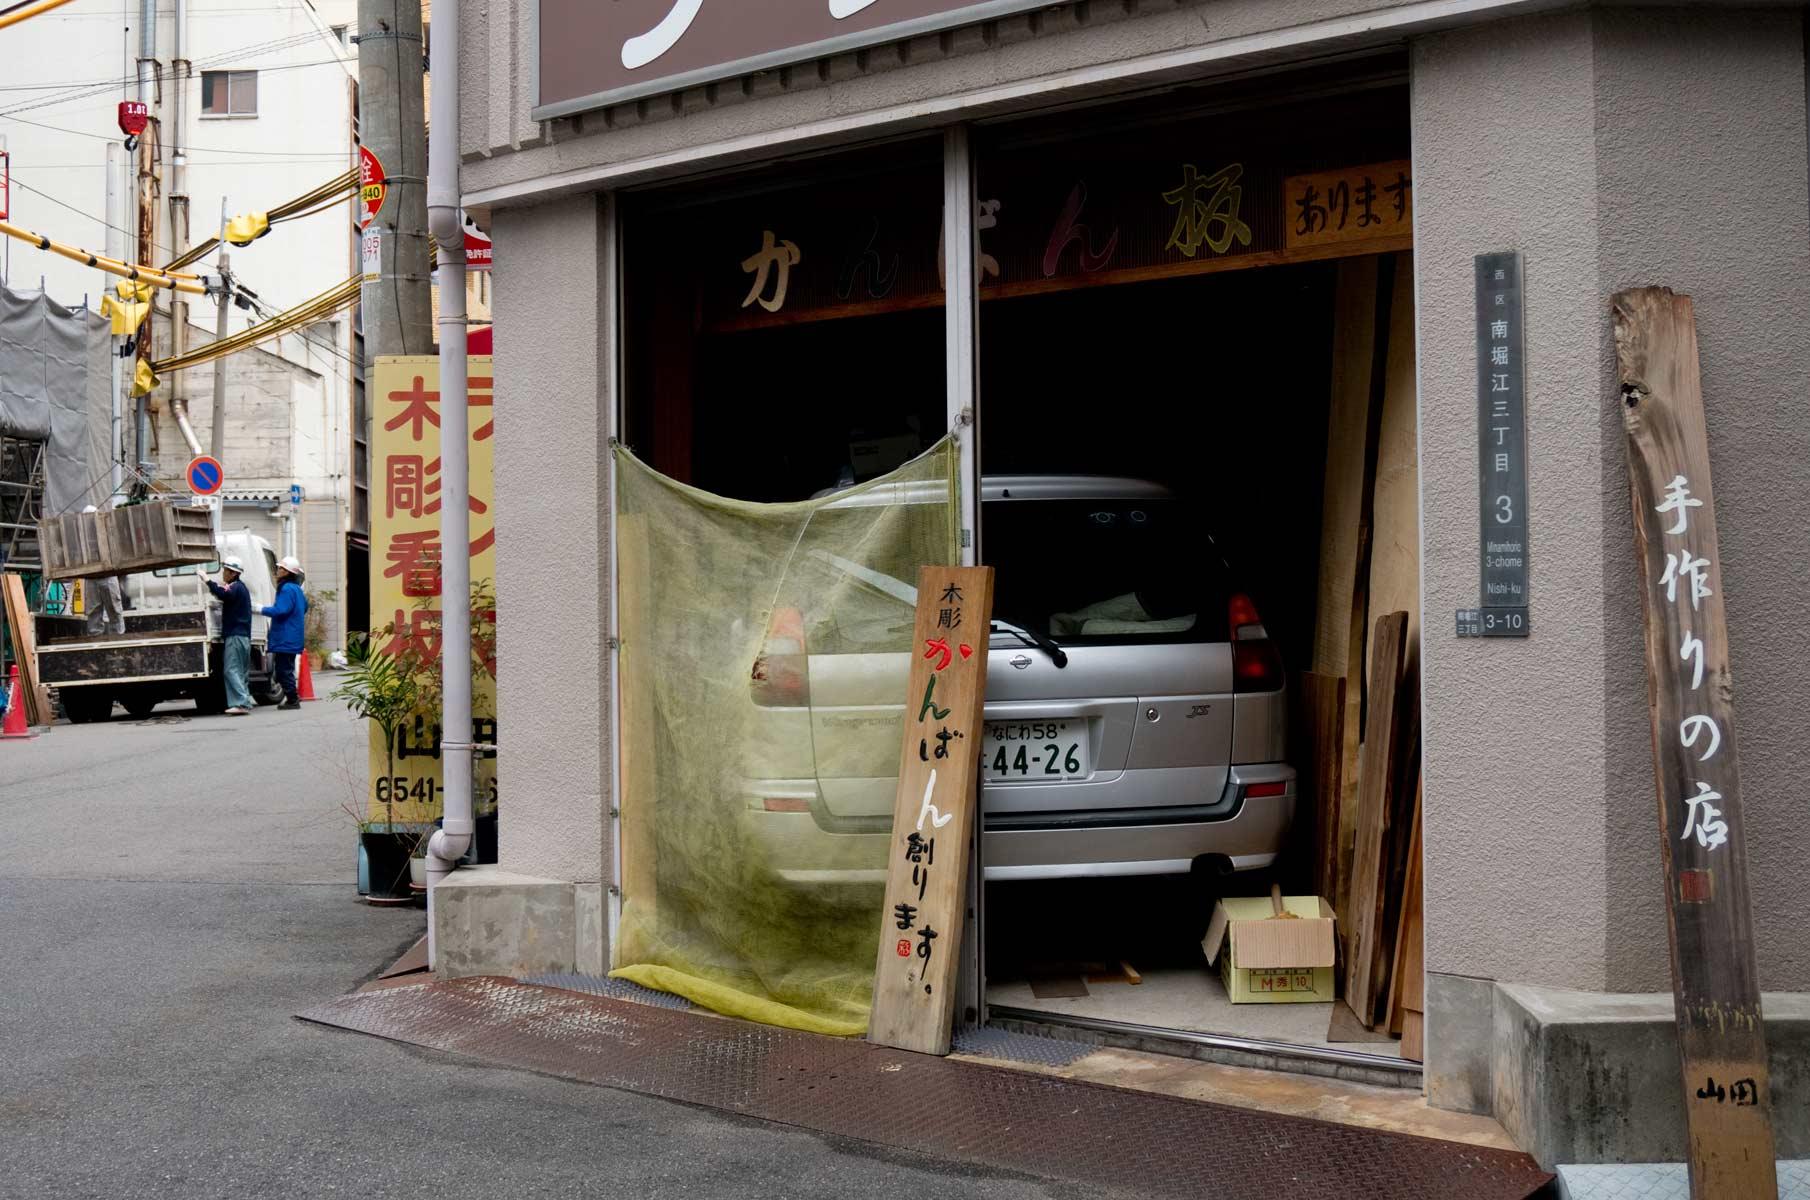 Parkendes Auto im Haus in Osaka, Japan